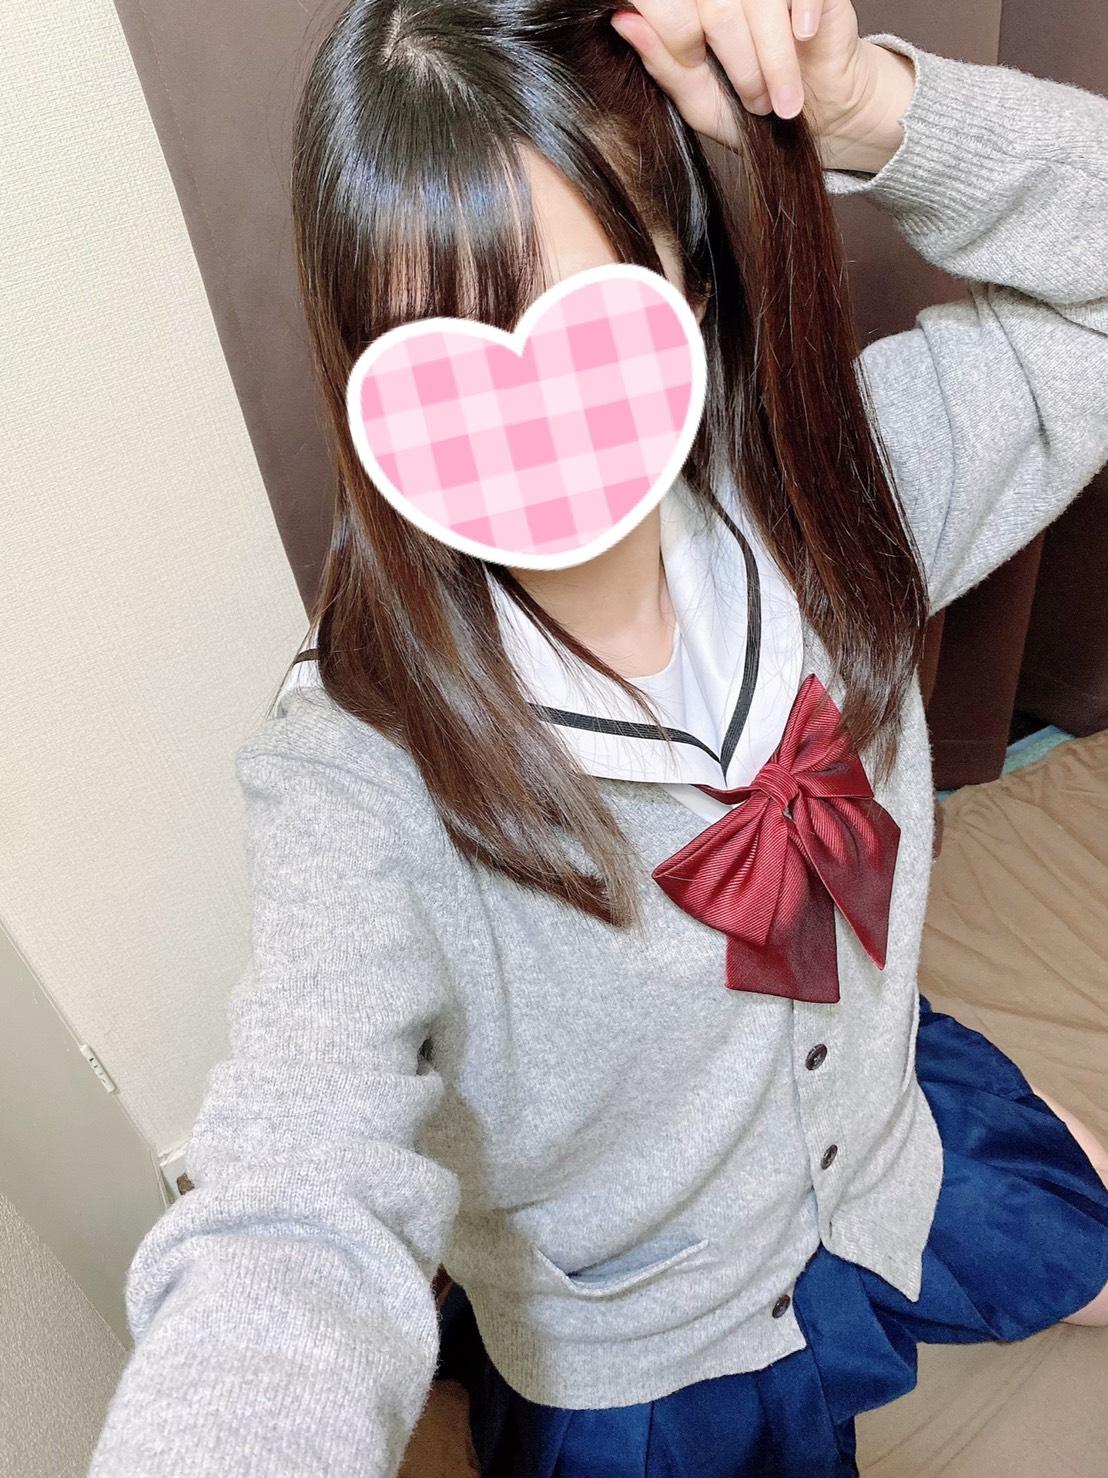 S__530800763